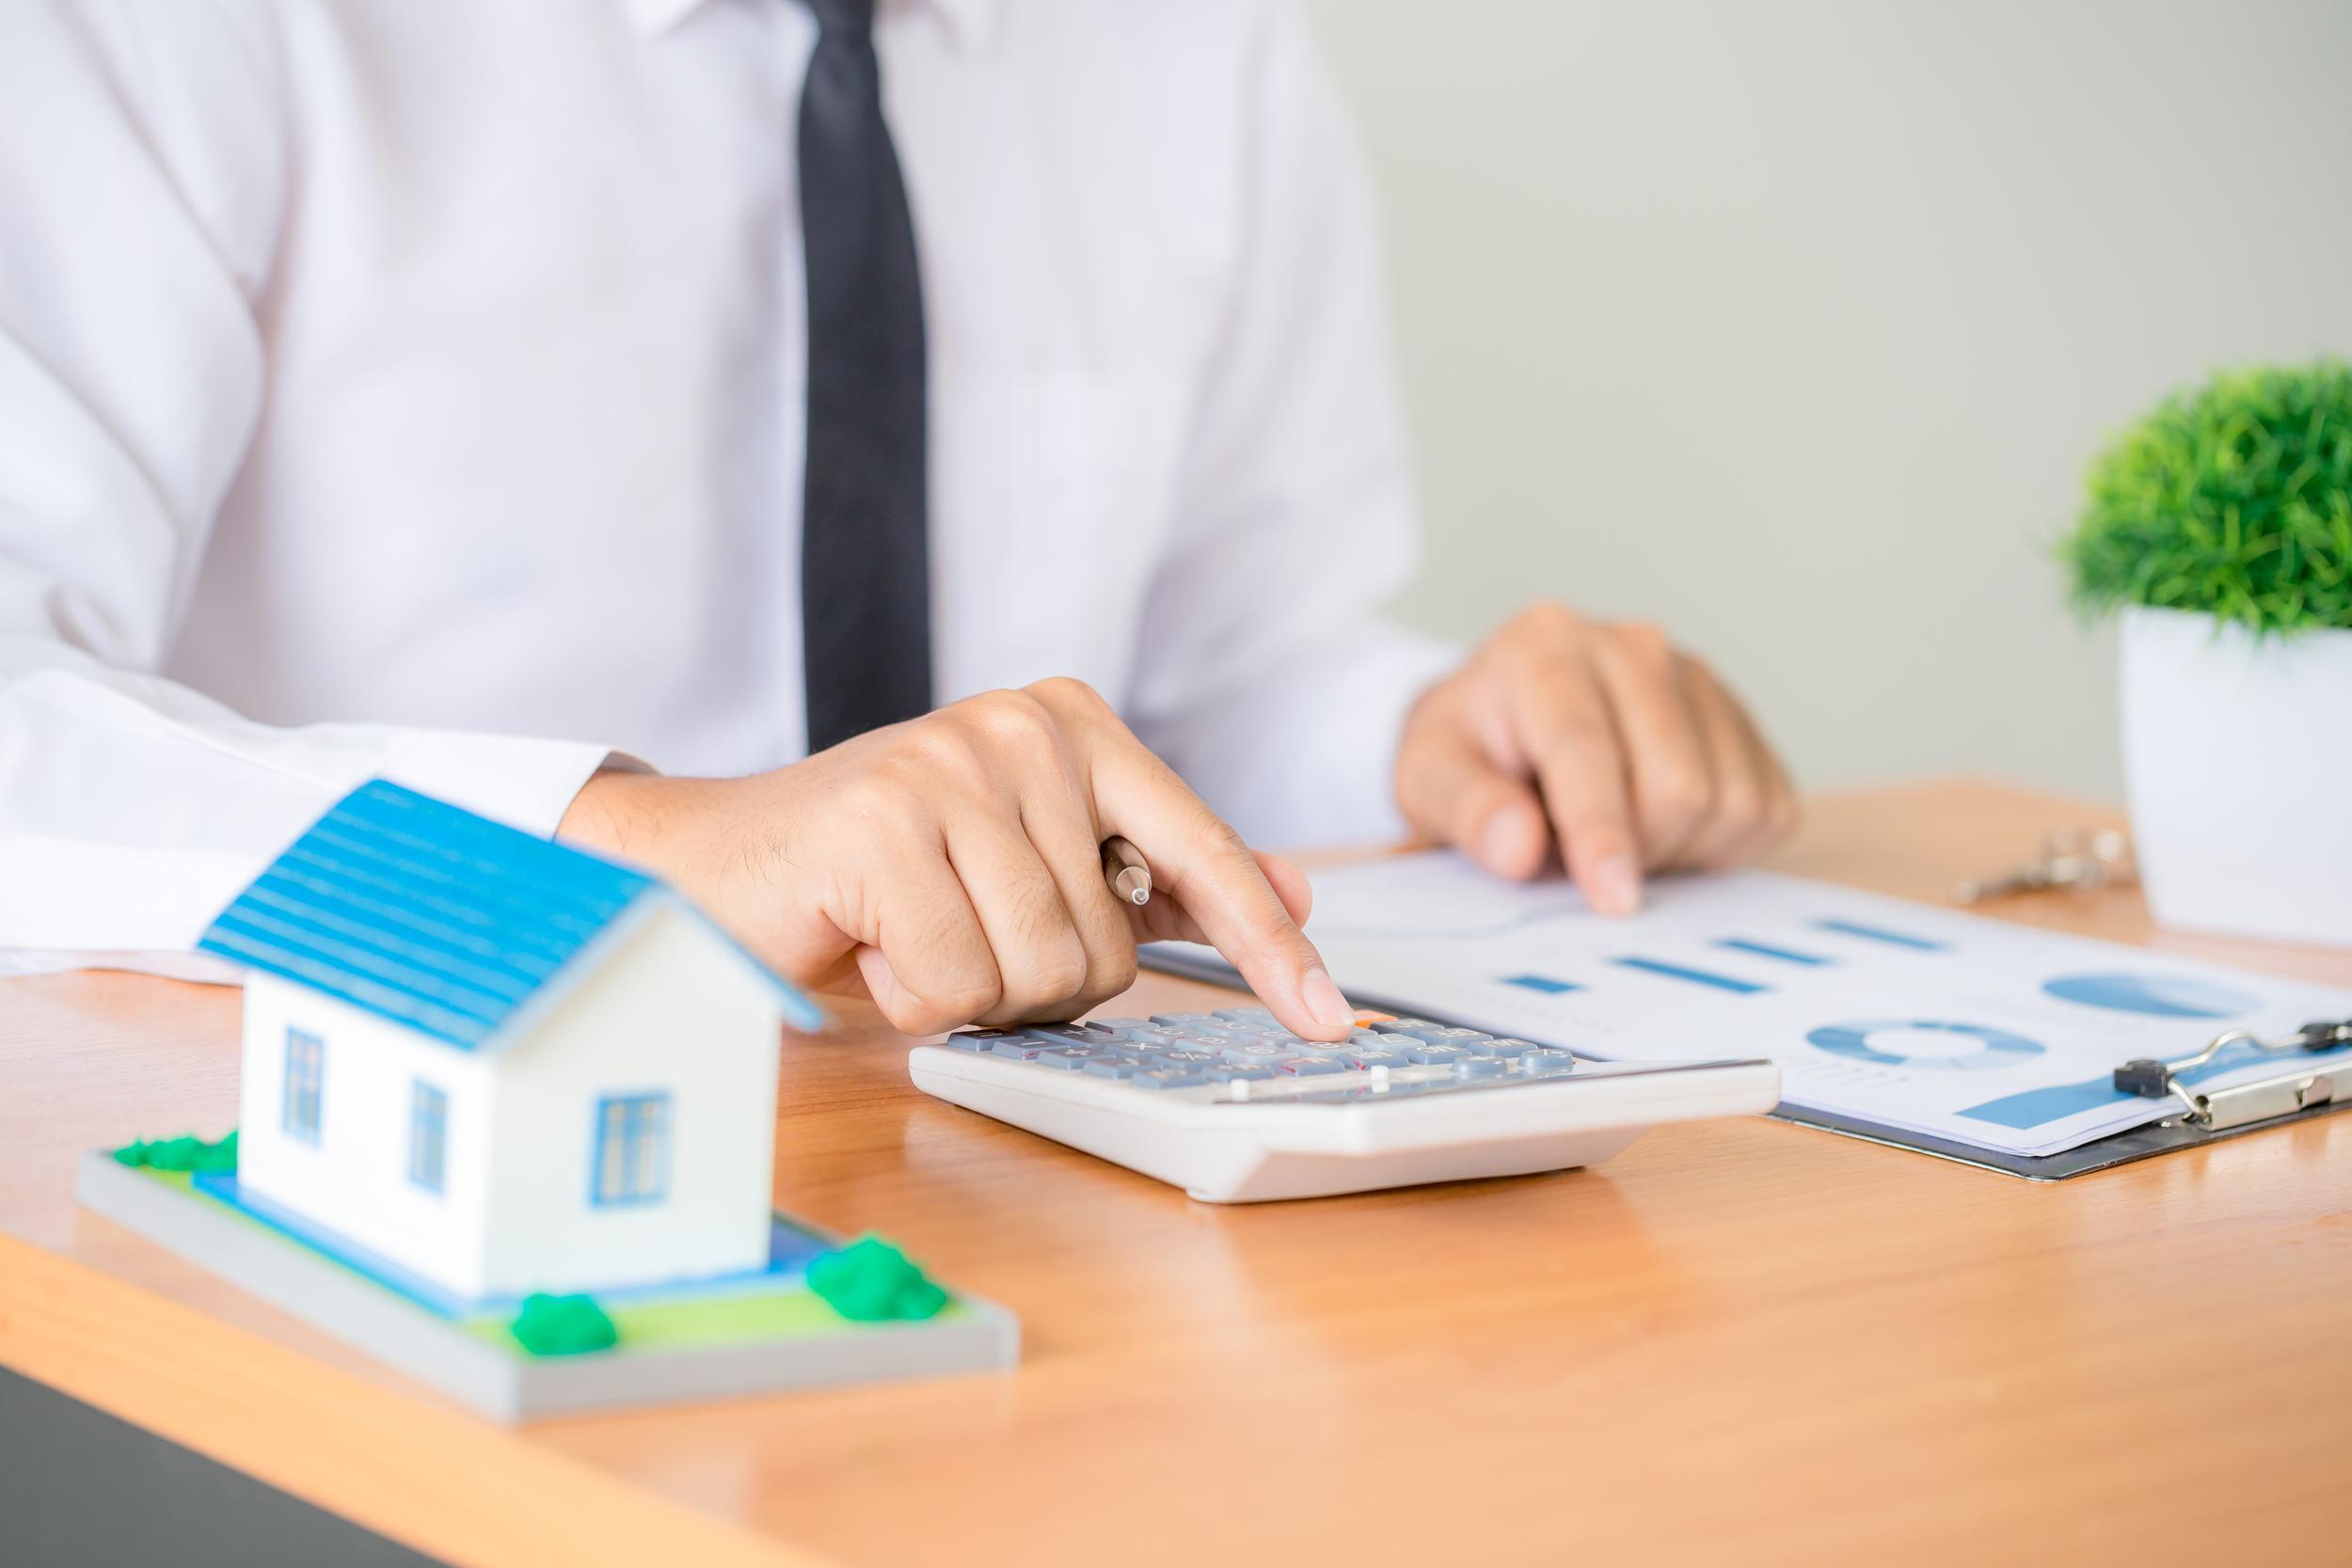 real-estate-broker-agent-presenting-consult-customer-decision-making-sign-insurance-form-agreement.jpg